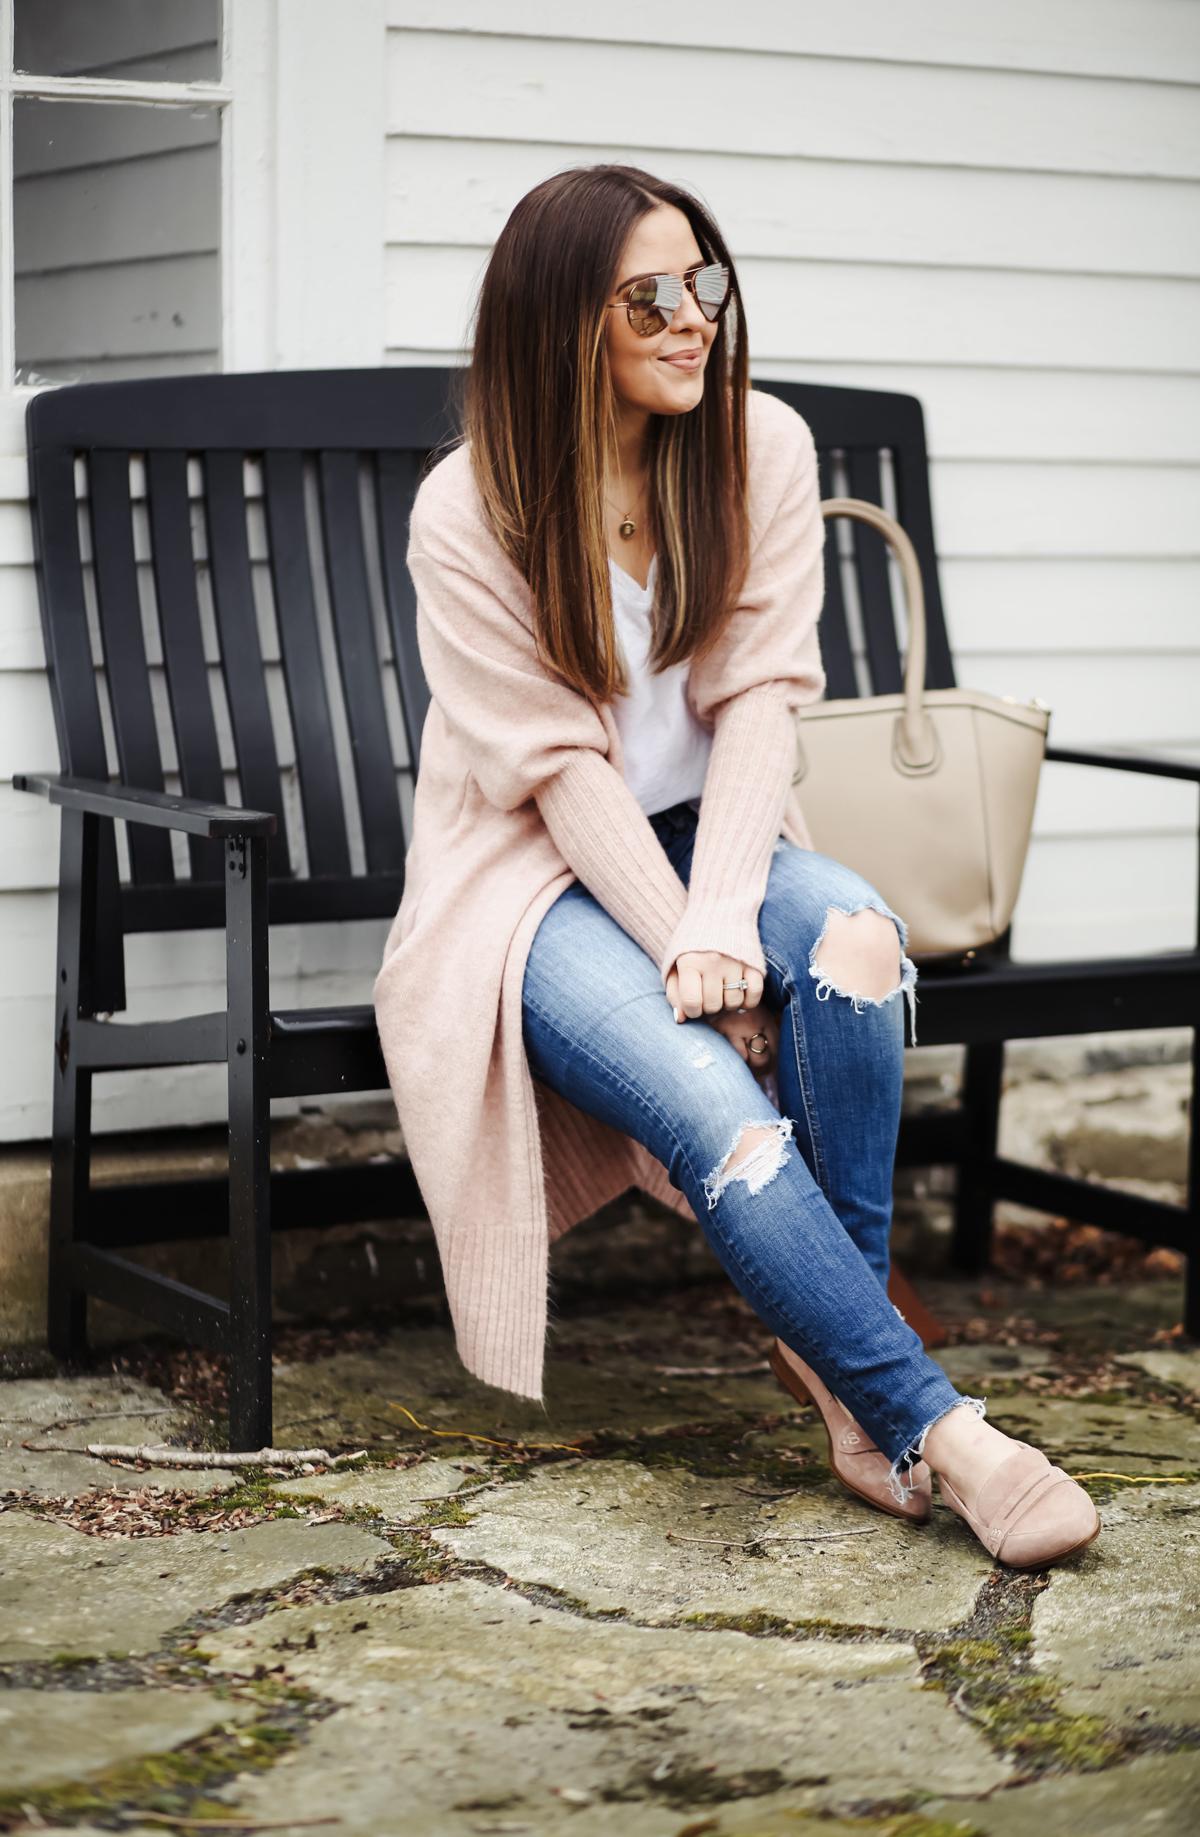 pink long cardigan easy momiform outfit ideas-17 - dress cori lynn